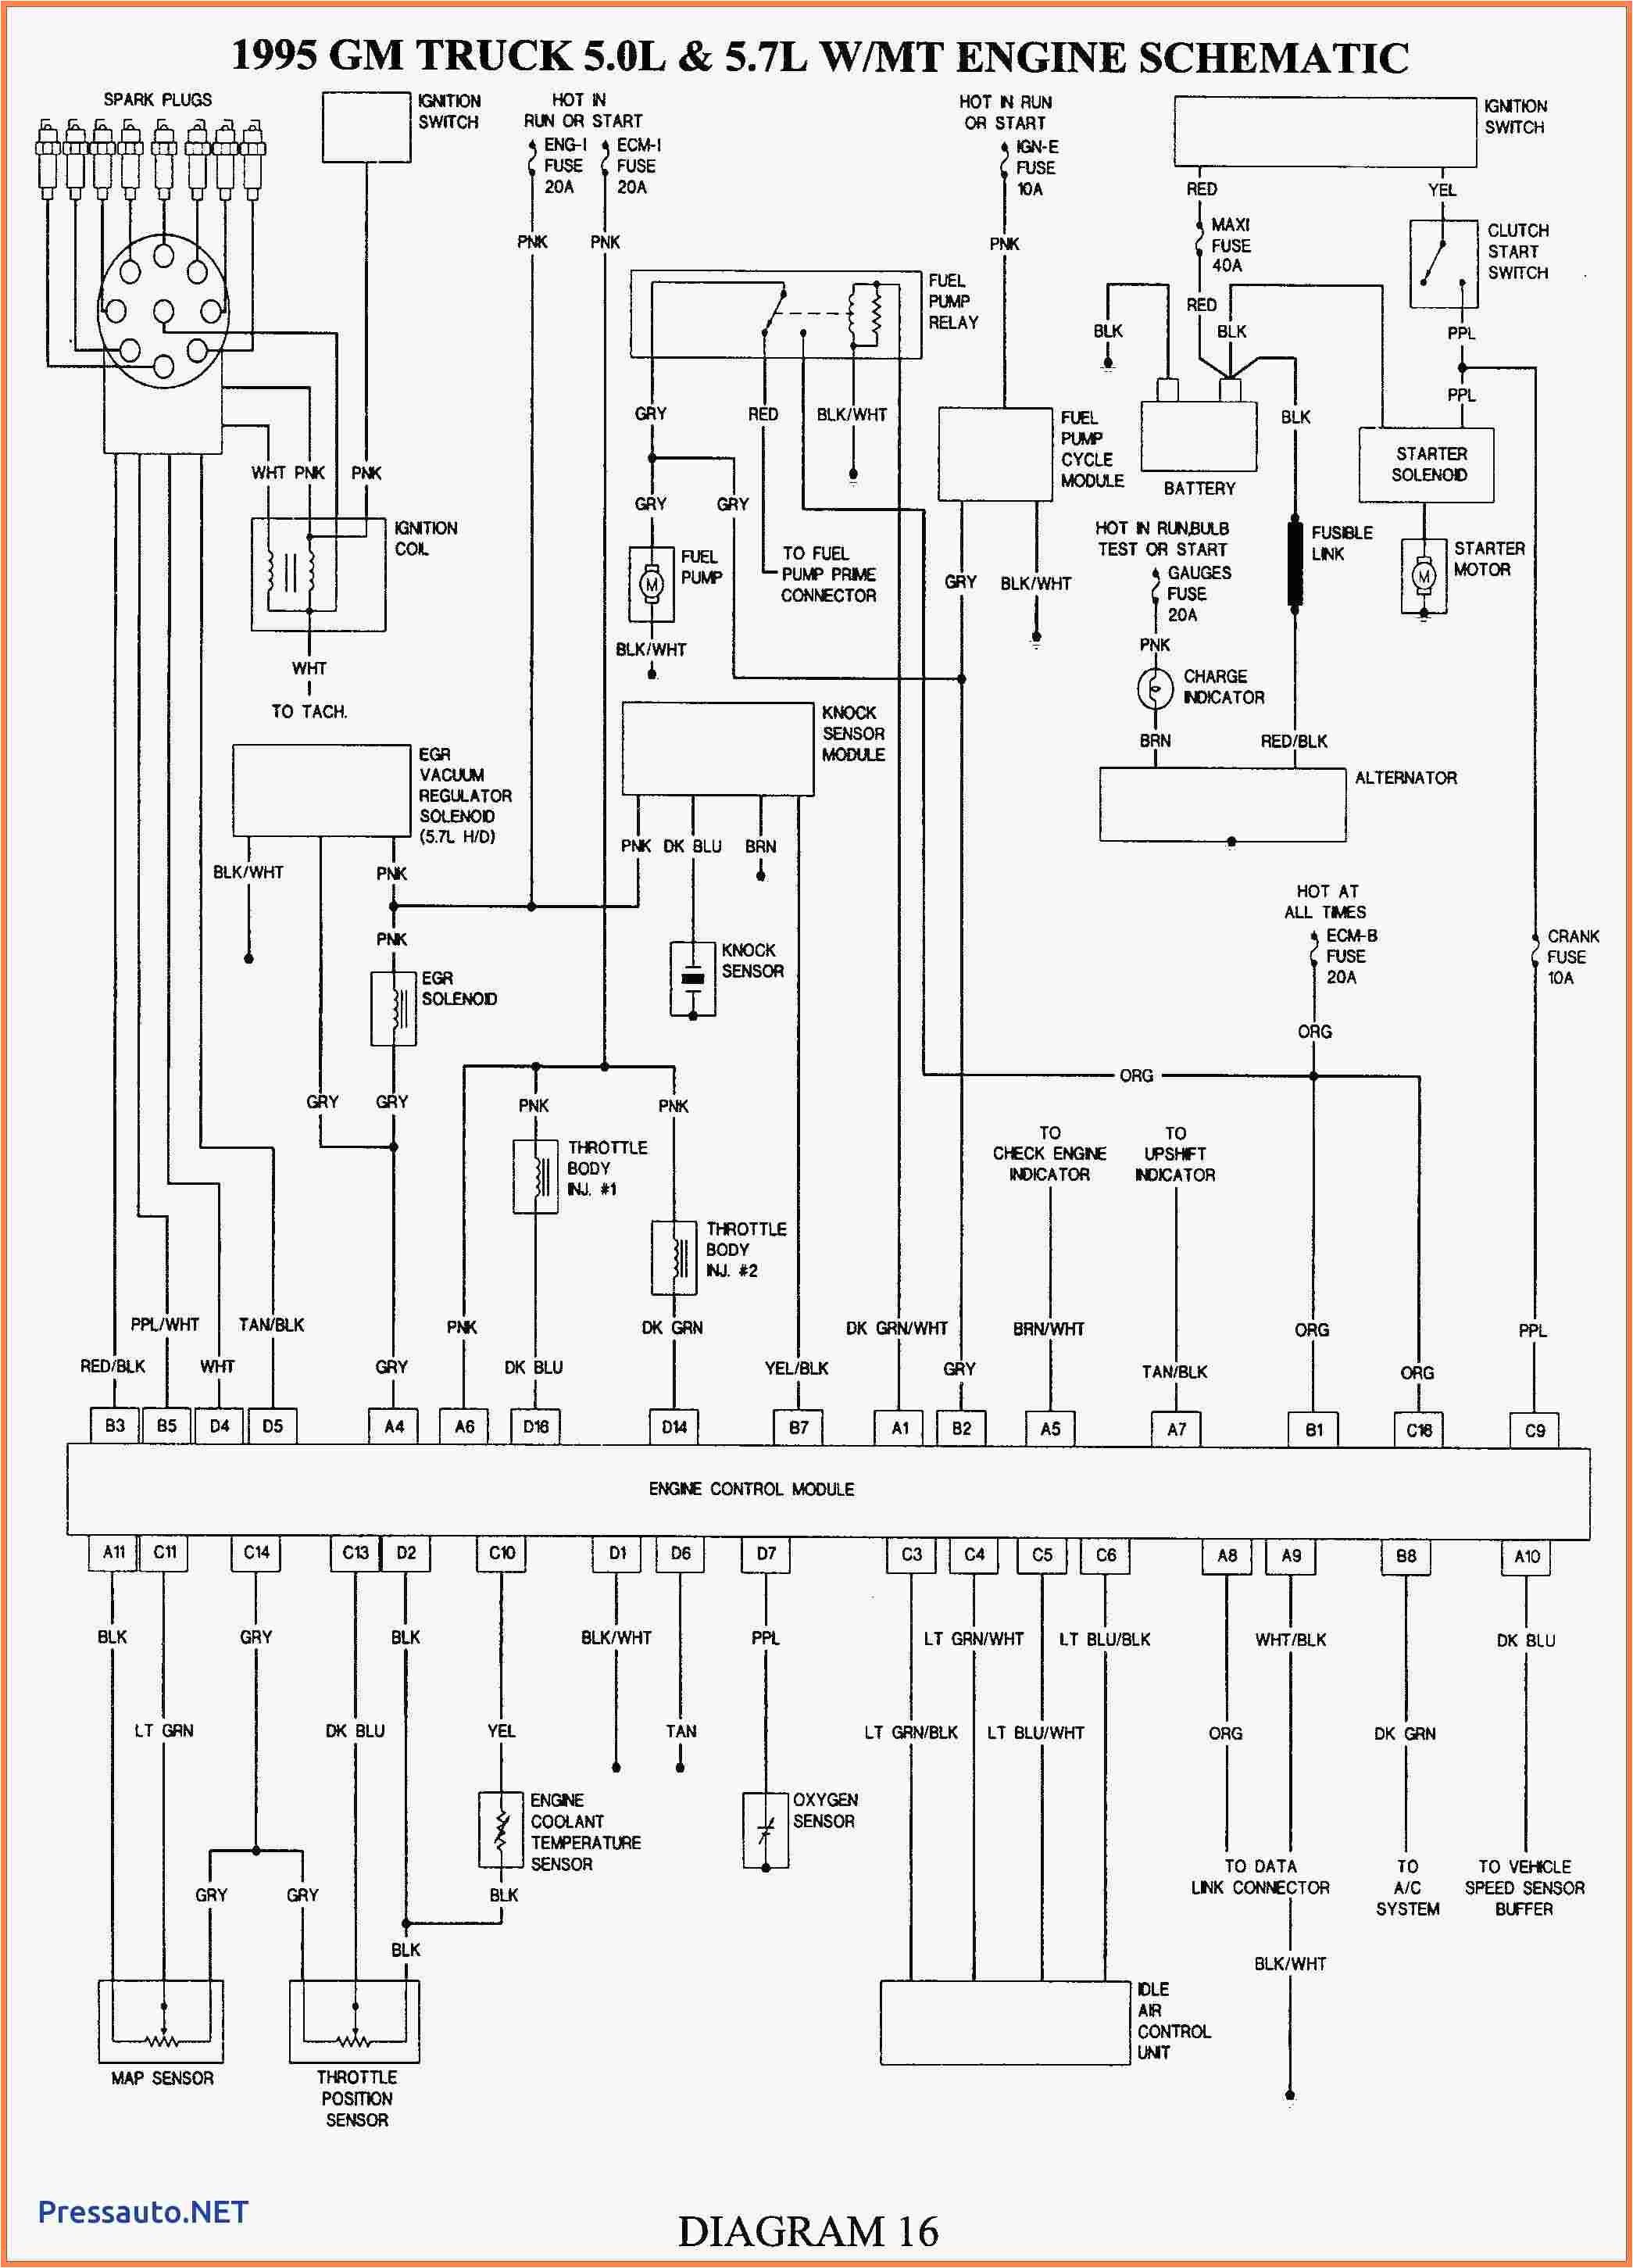 2002 gmc sierra 1500 engine diagram wiring diagram post 02 gmc sierra engine diagram wiring diagram